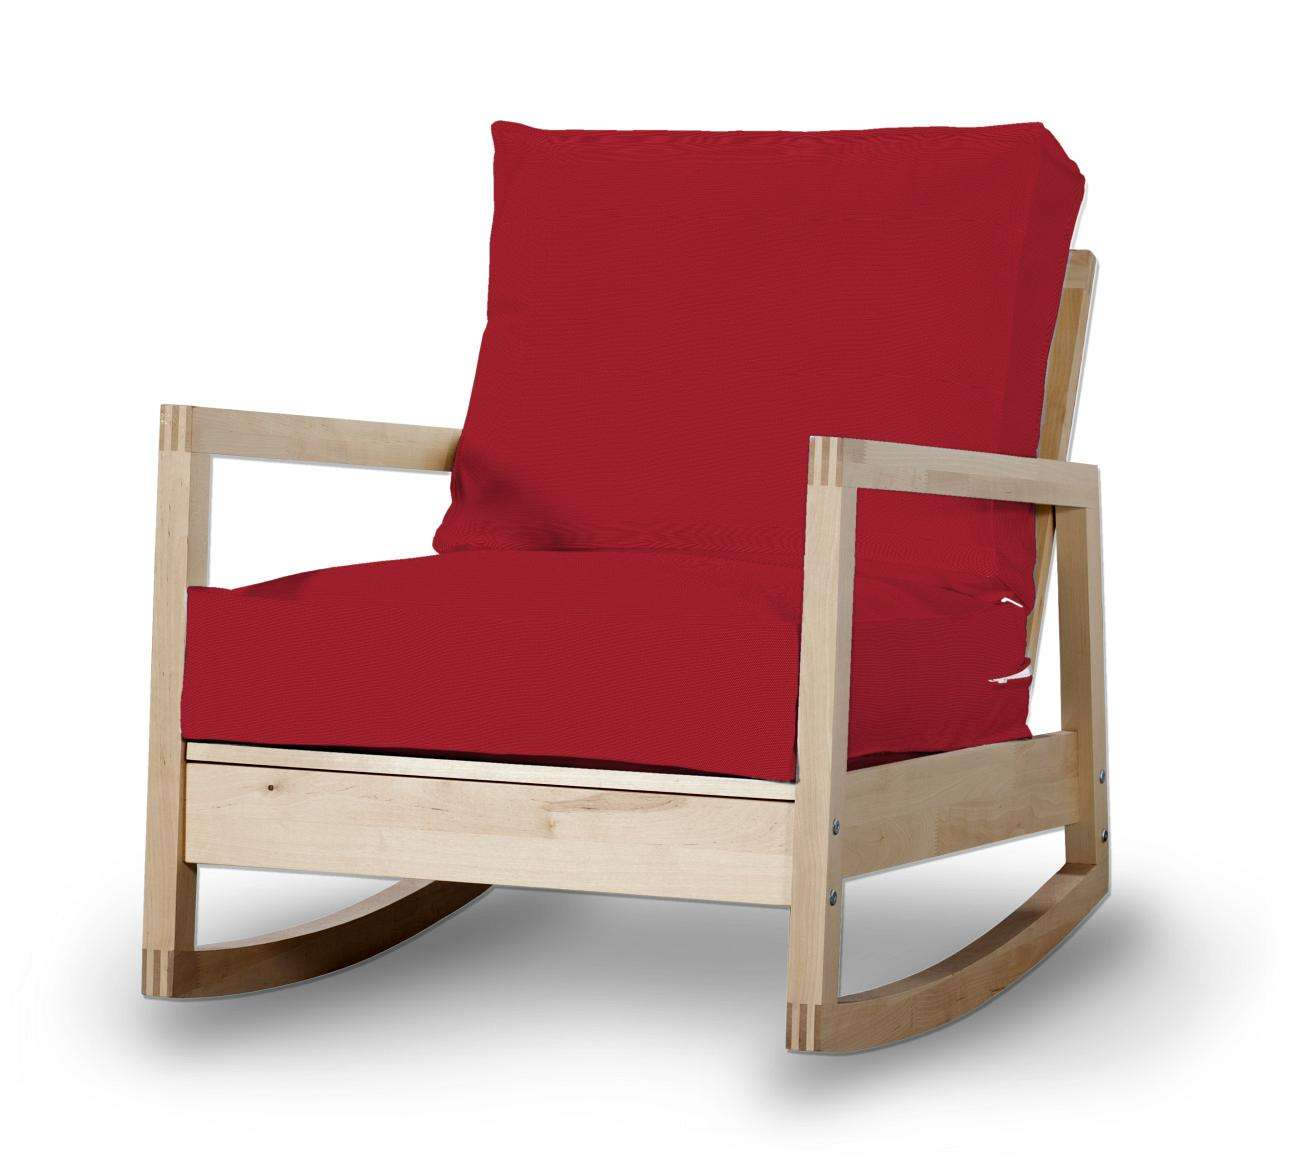 Lillberg Sesselbezug Sesselhusse, Modell Lillberg von der Kollektion Etna, Stoff: 705-60